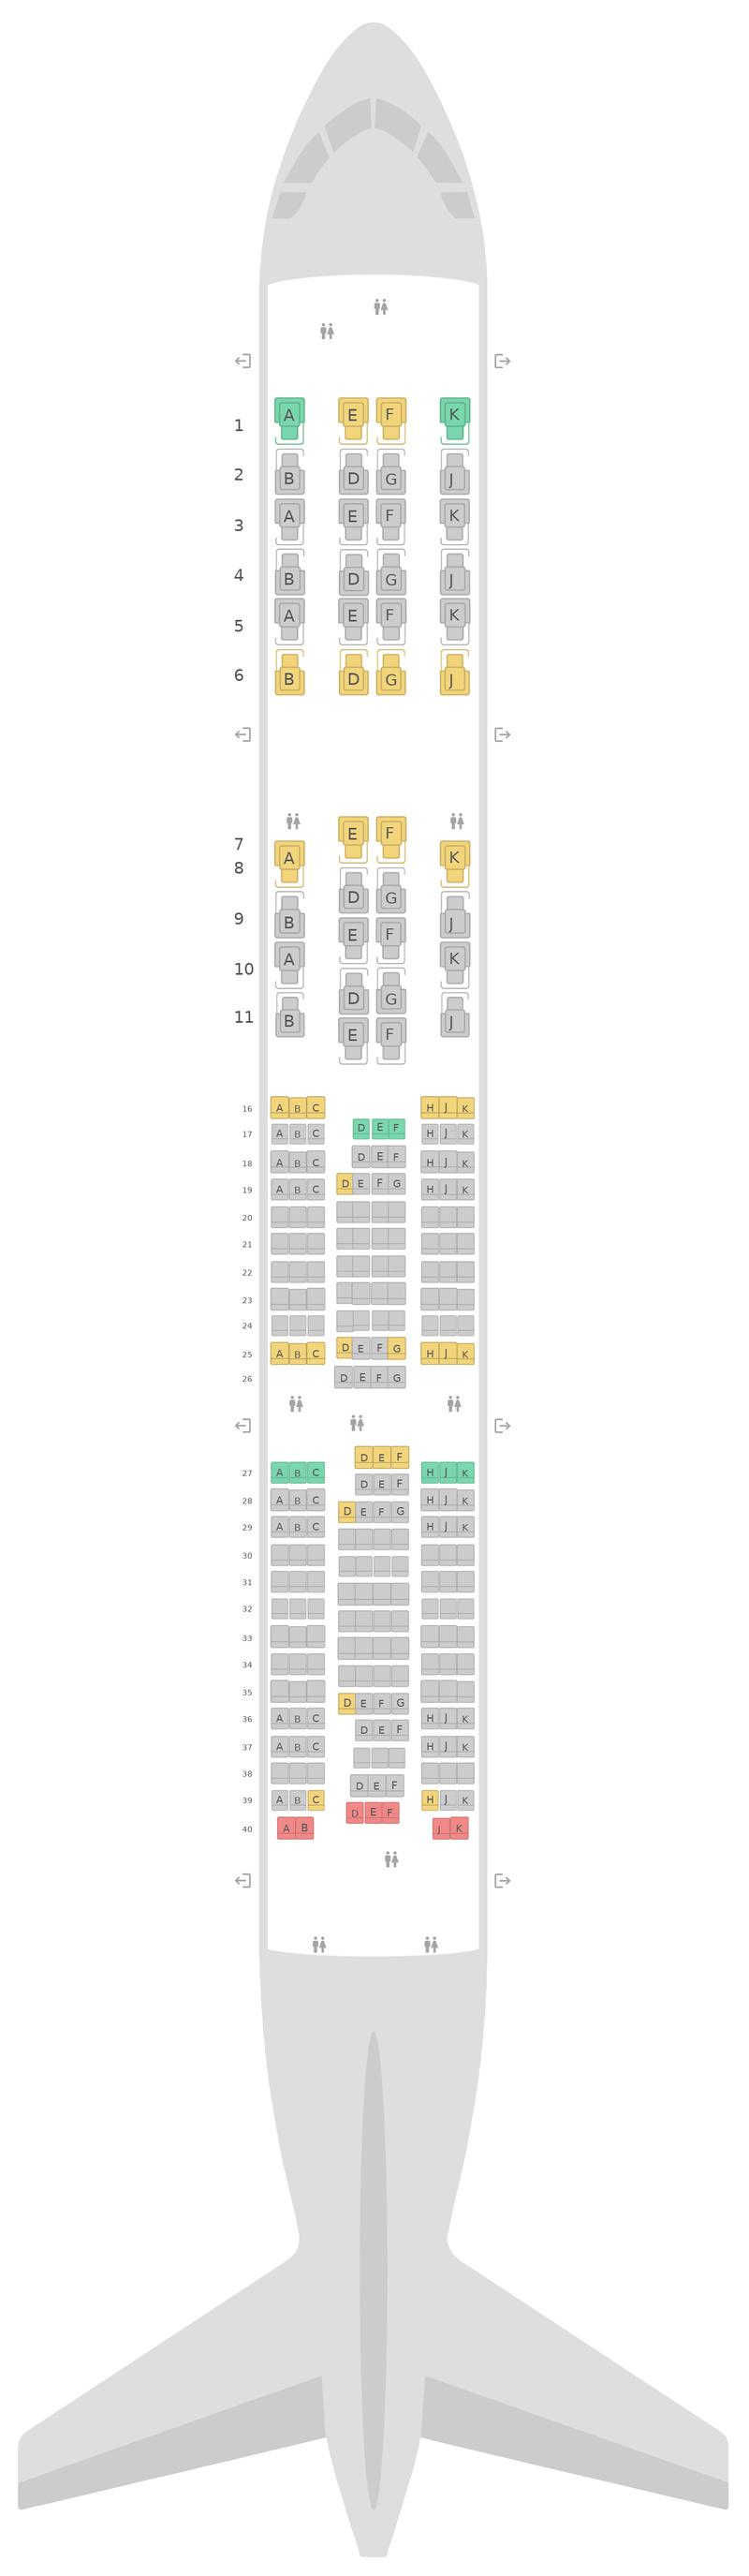 Mapa de asientos Boeing 777-200LR Qsuite v2 Qatar Airways